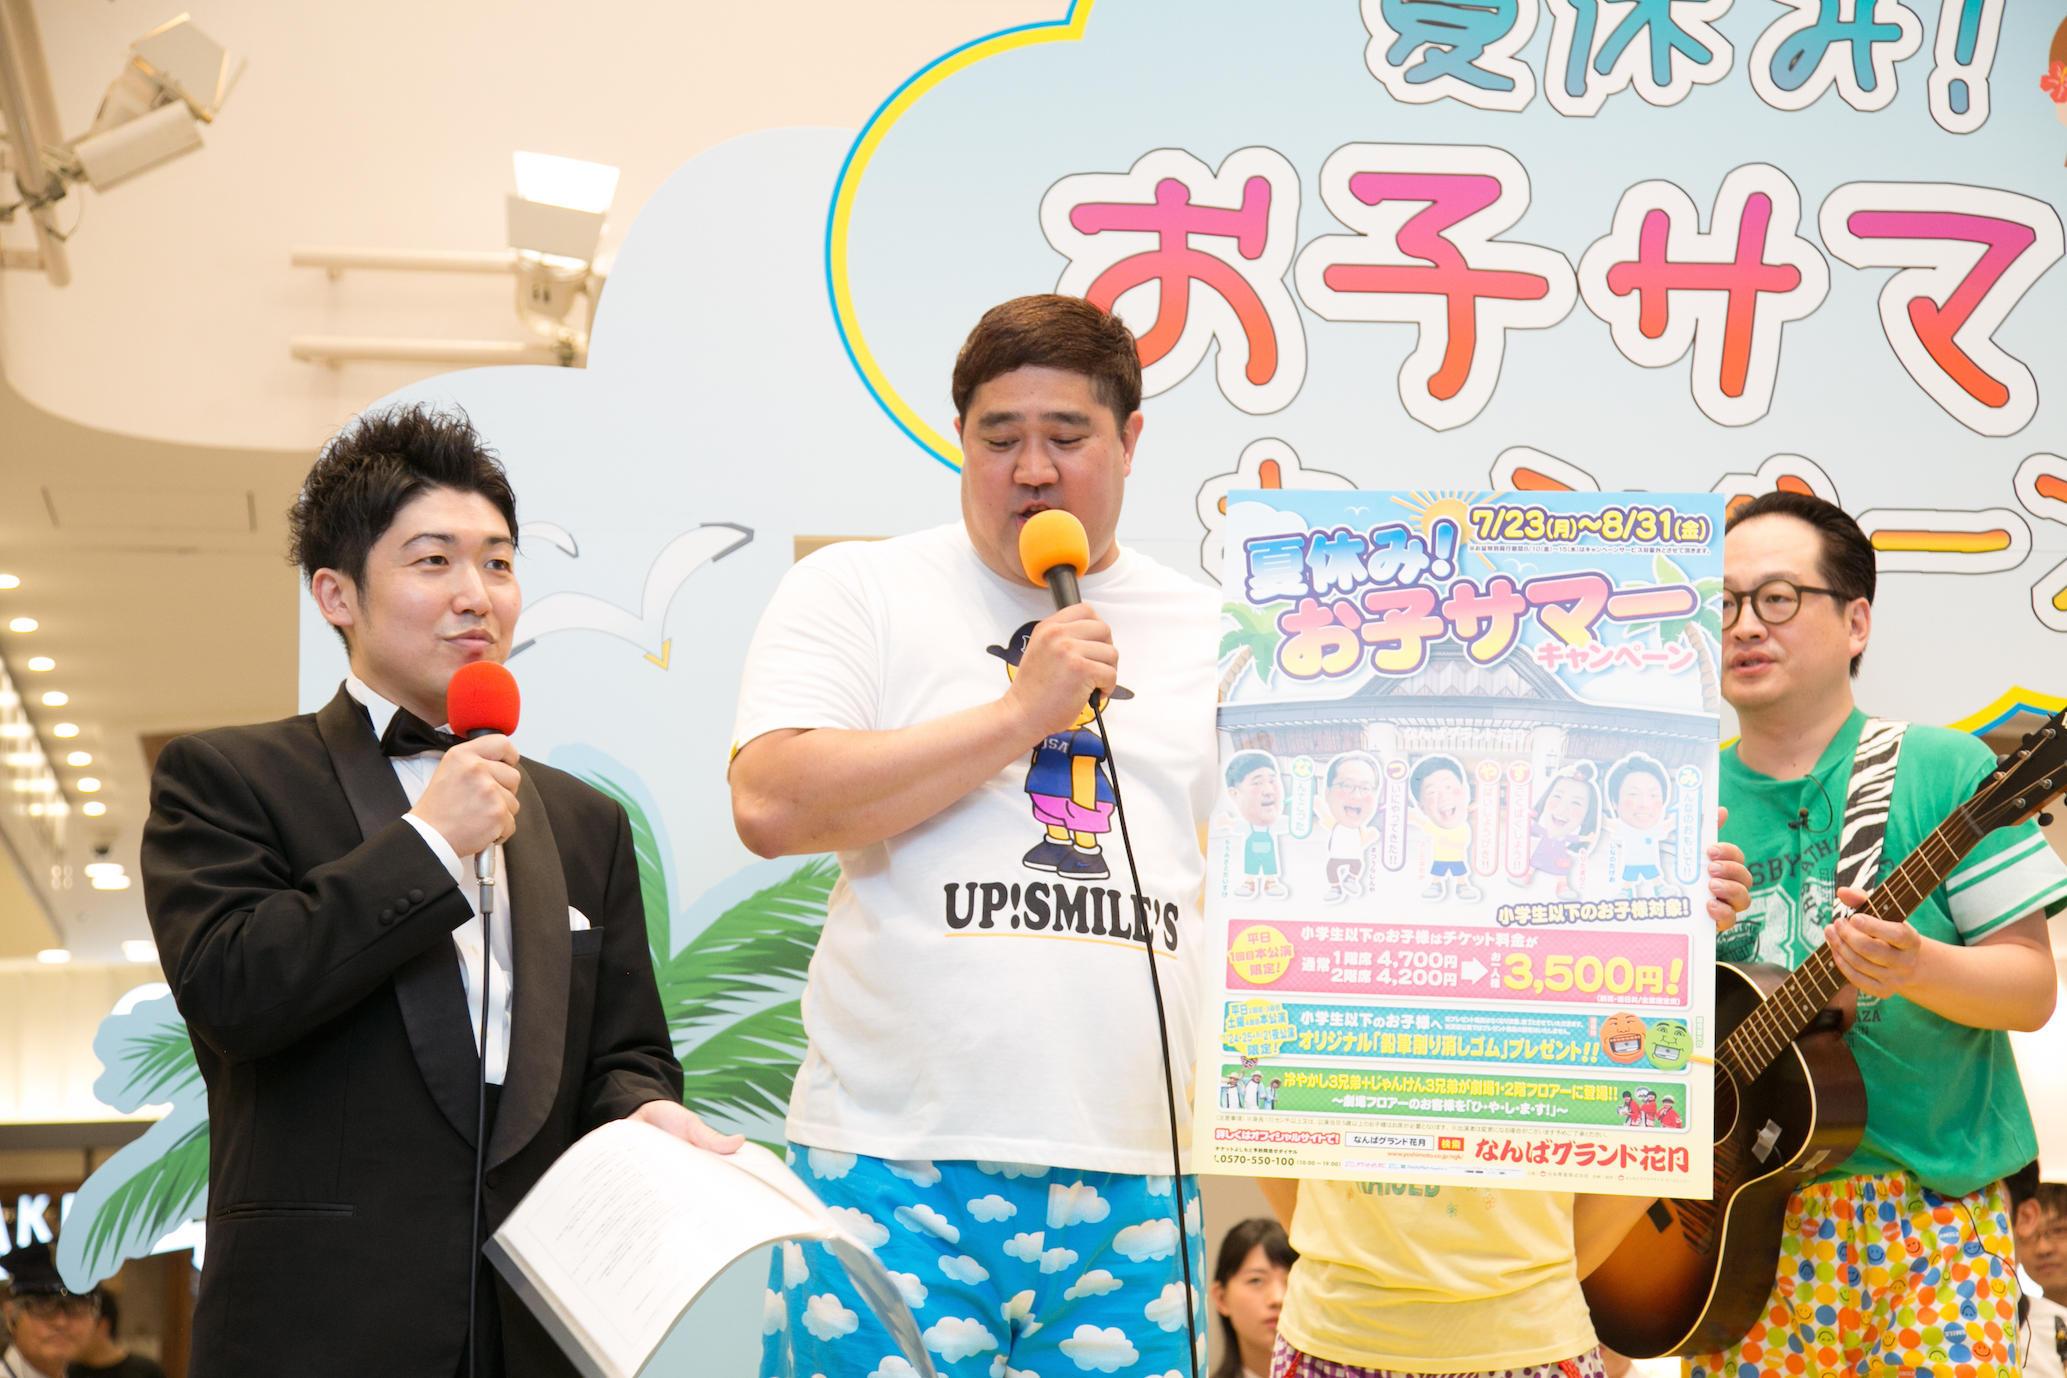 http://news.yoshimoto.co.jp/20180717223030-b5ada3343e25d2918f2d749463d9a7be51d74c94.jpg